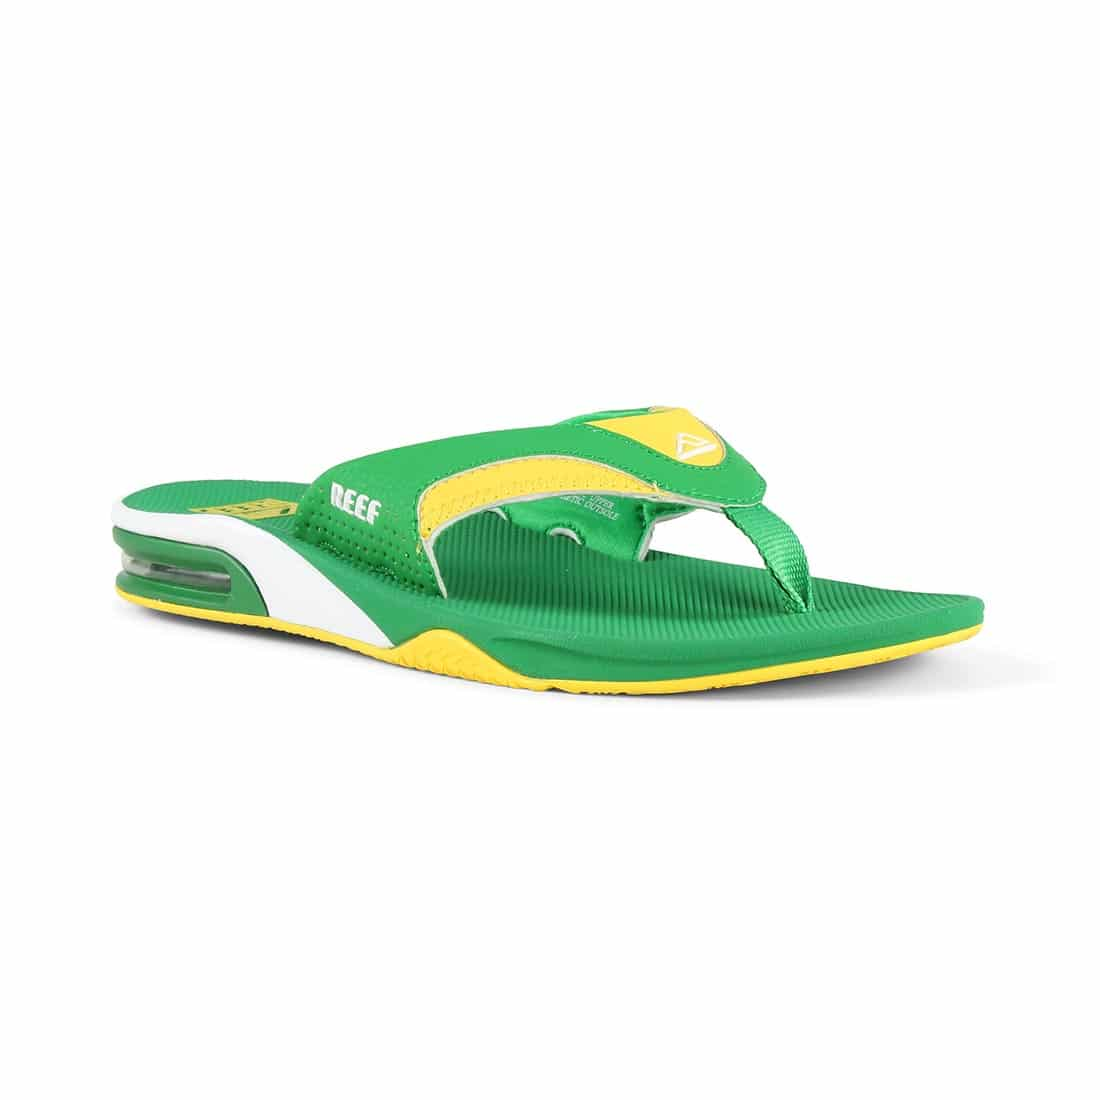 Reef Fanning Sandals Green Yellow